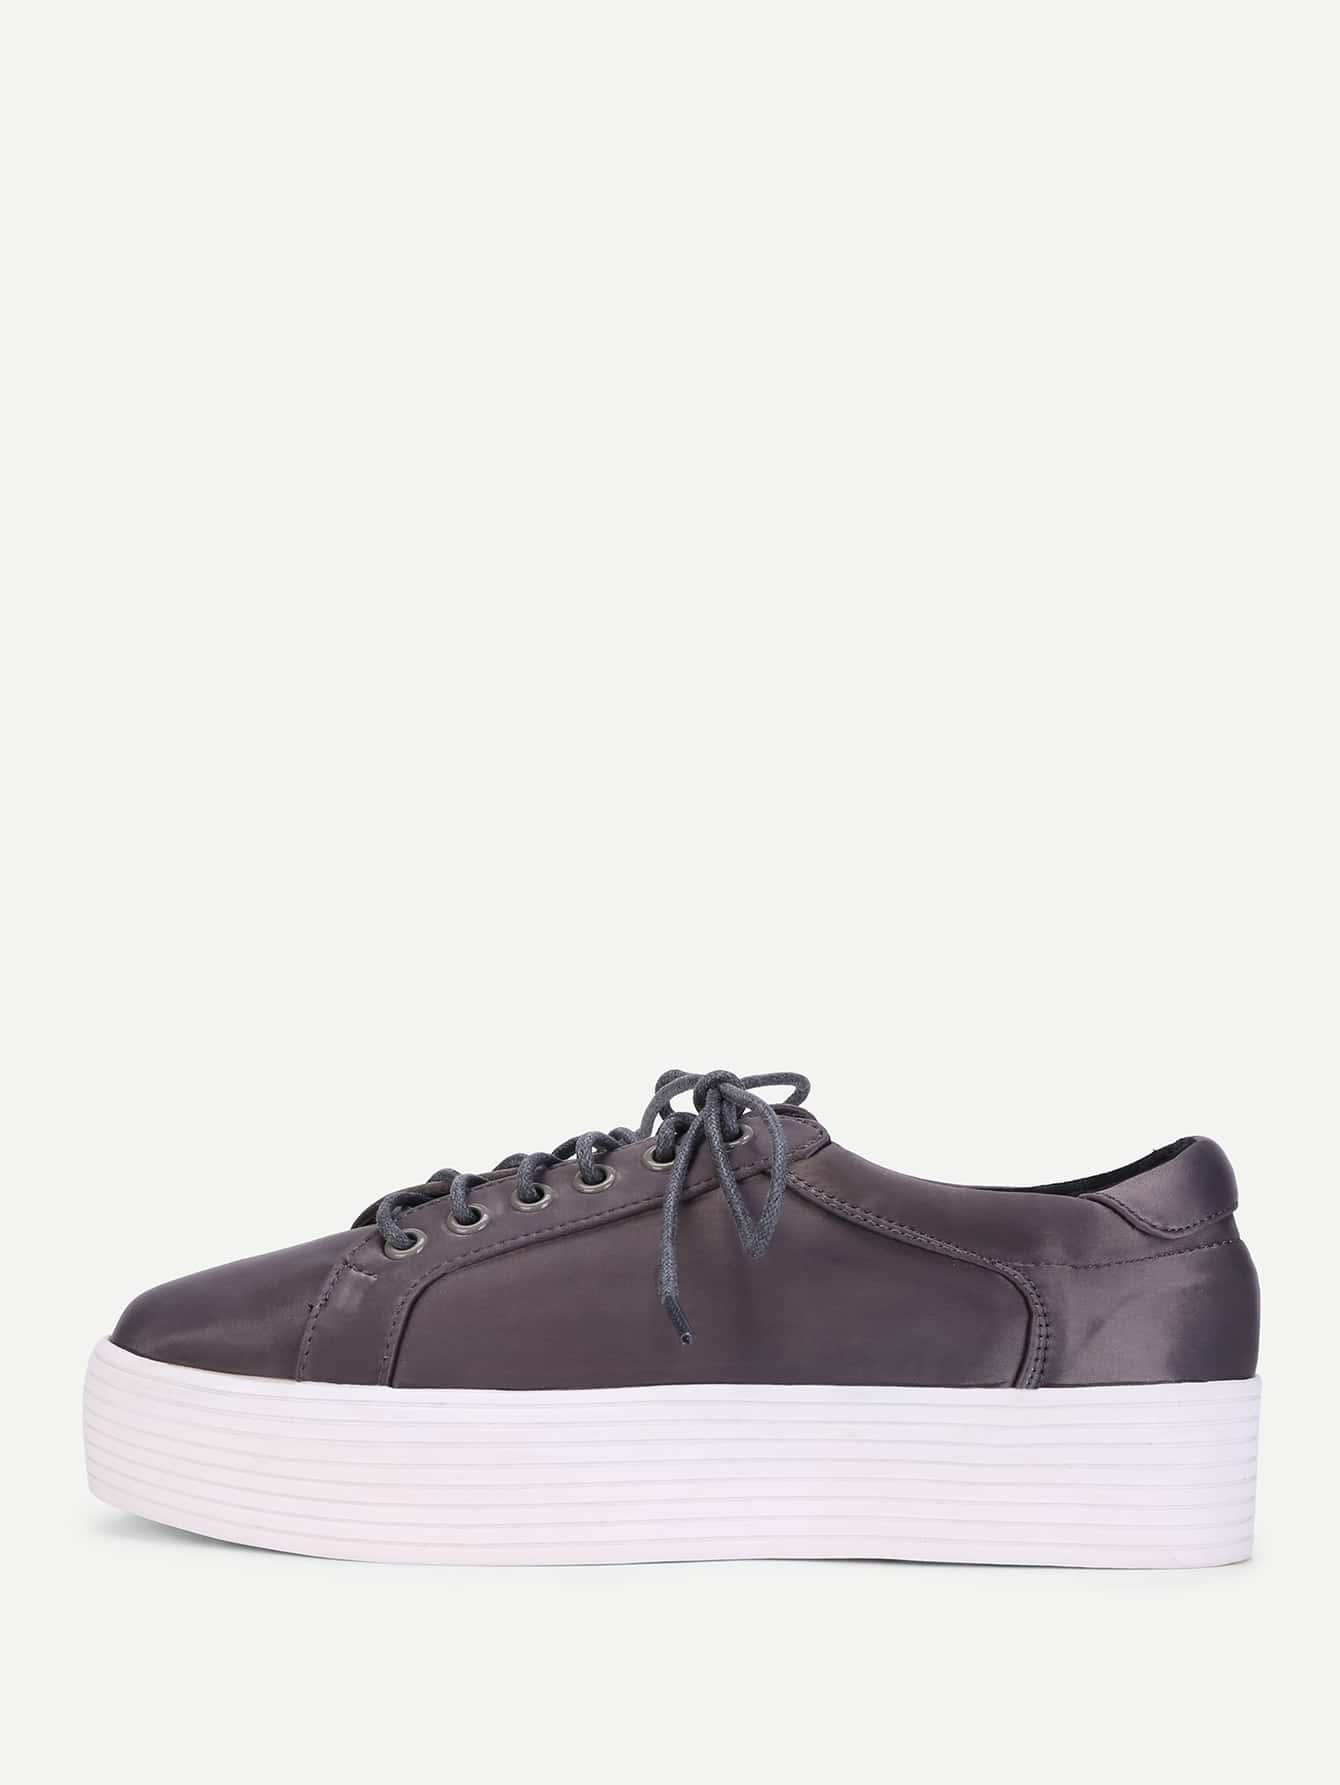 Lace Up Flatform Satin Shoes lace up flatform satin shoes